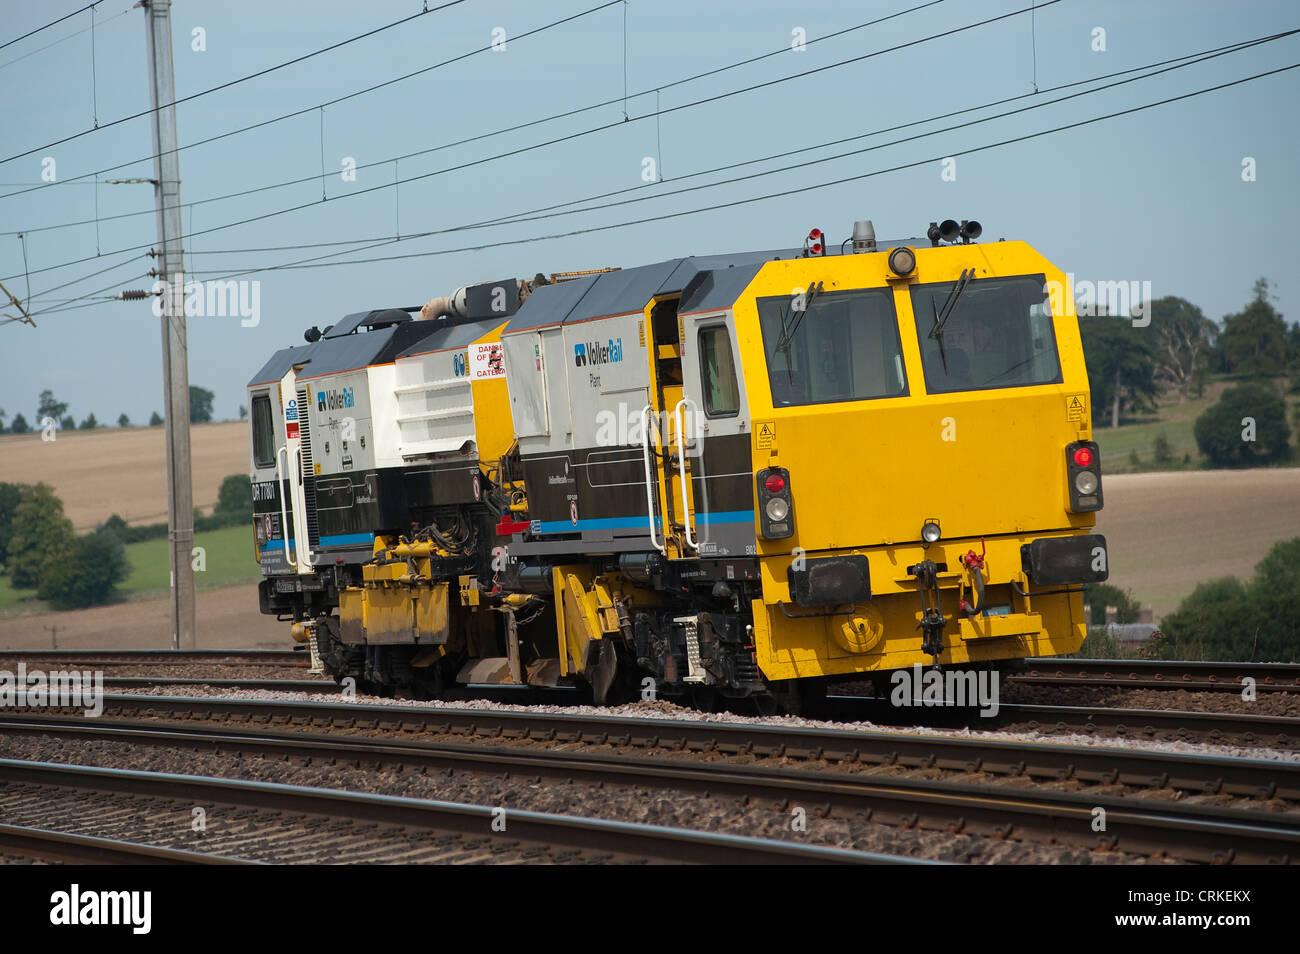 VolkerRail Ballast Regulator maintenance train on the Midland mainline, England. - Stock Image